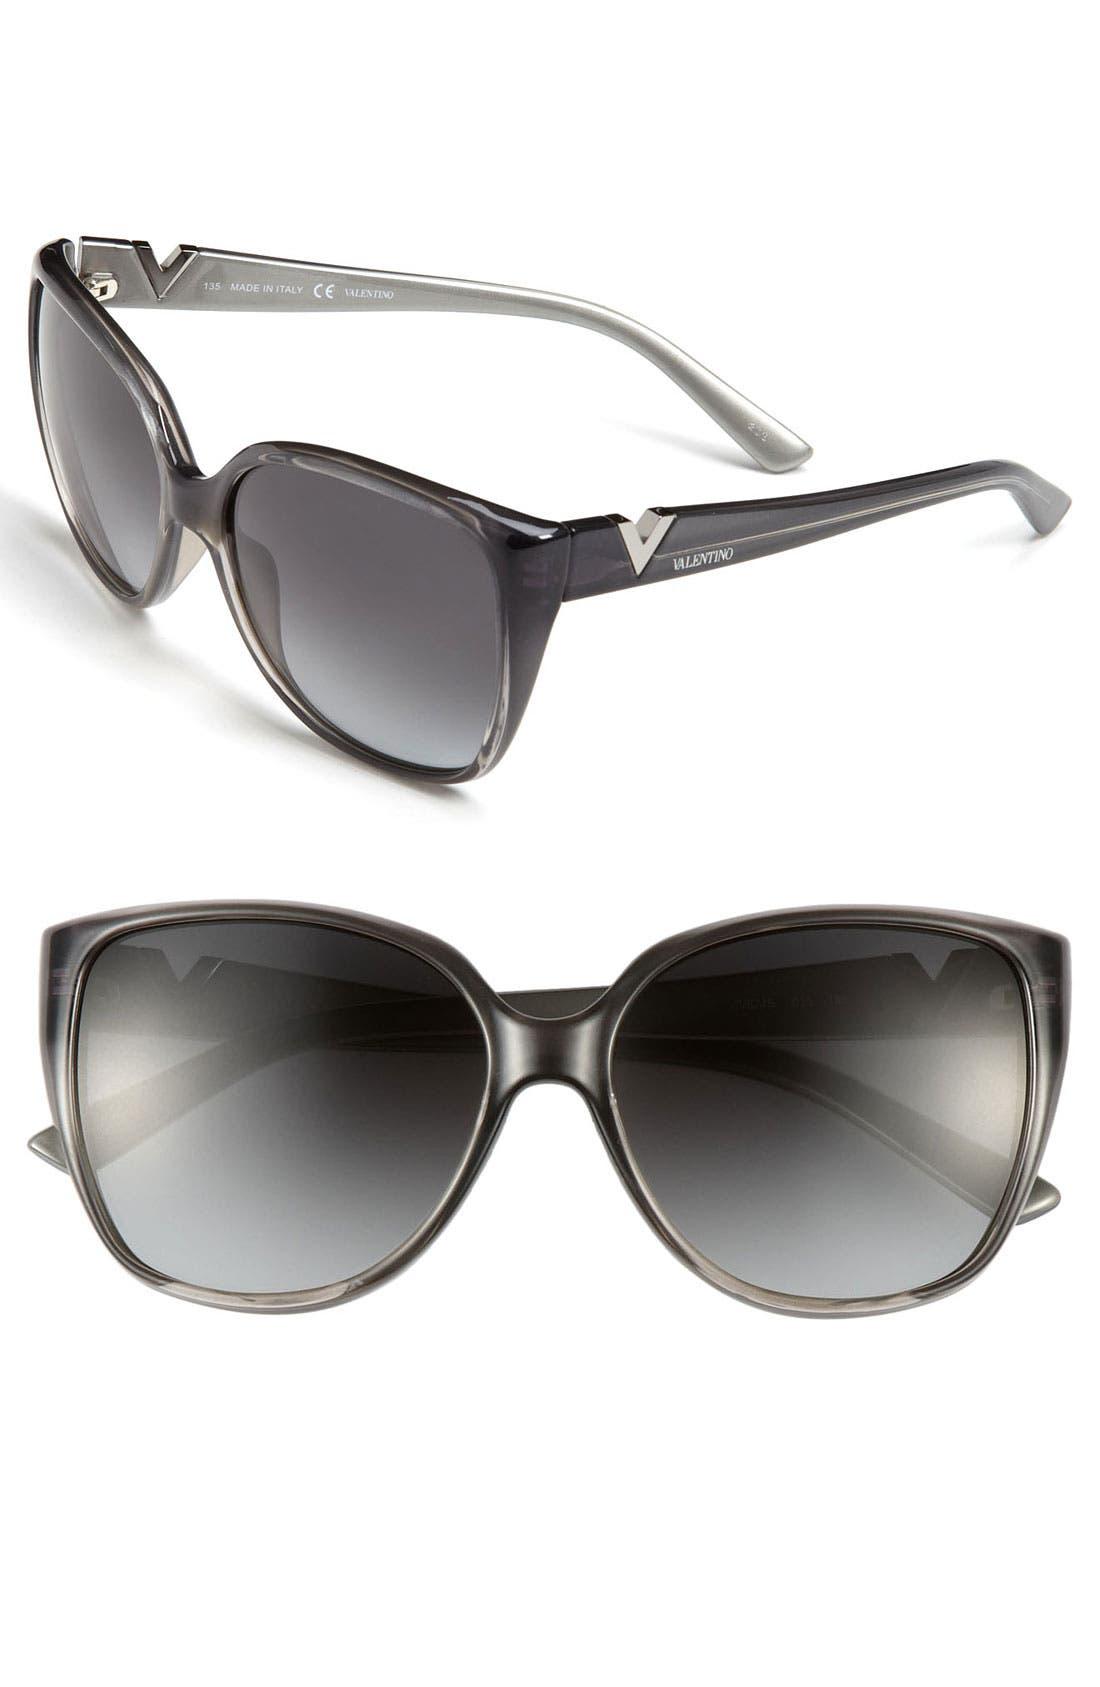 Main Image - Valentino 56mm Oversized Sunglasses